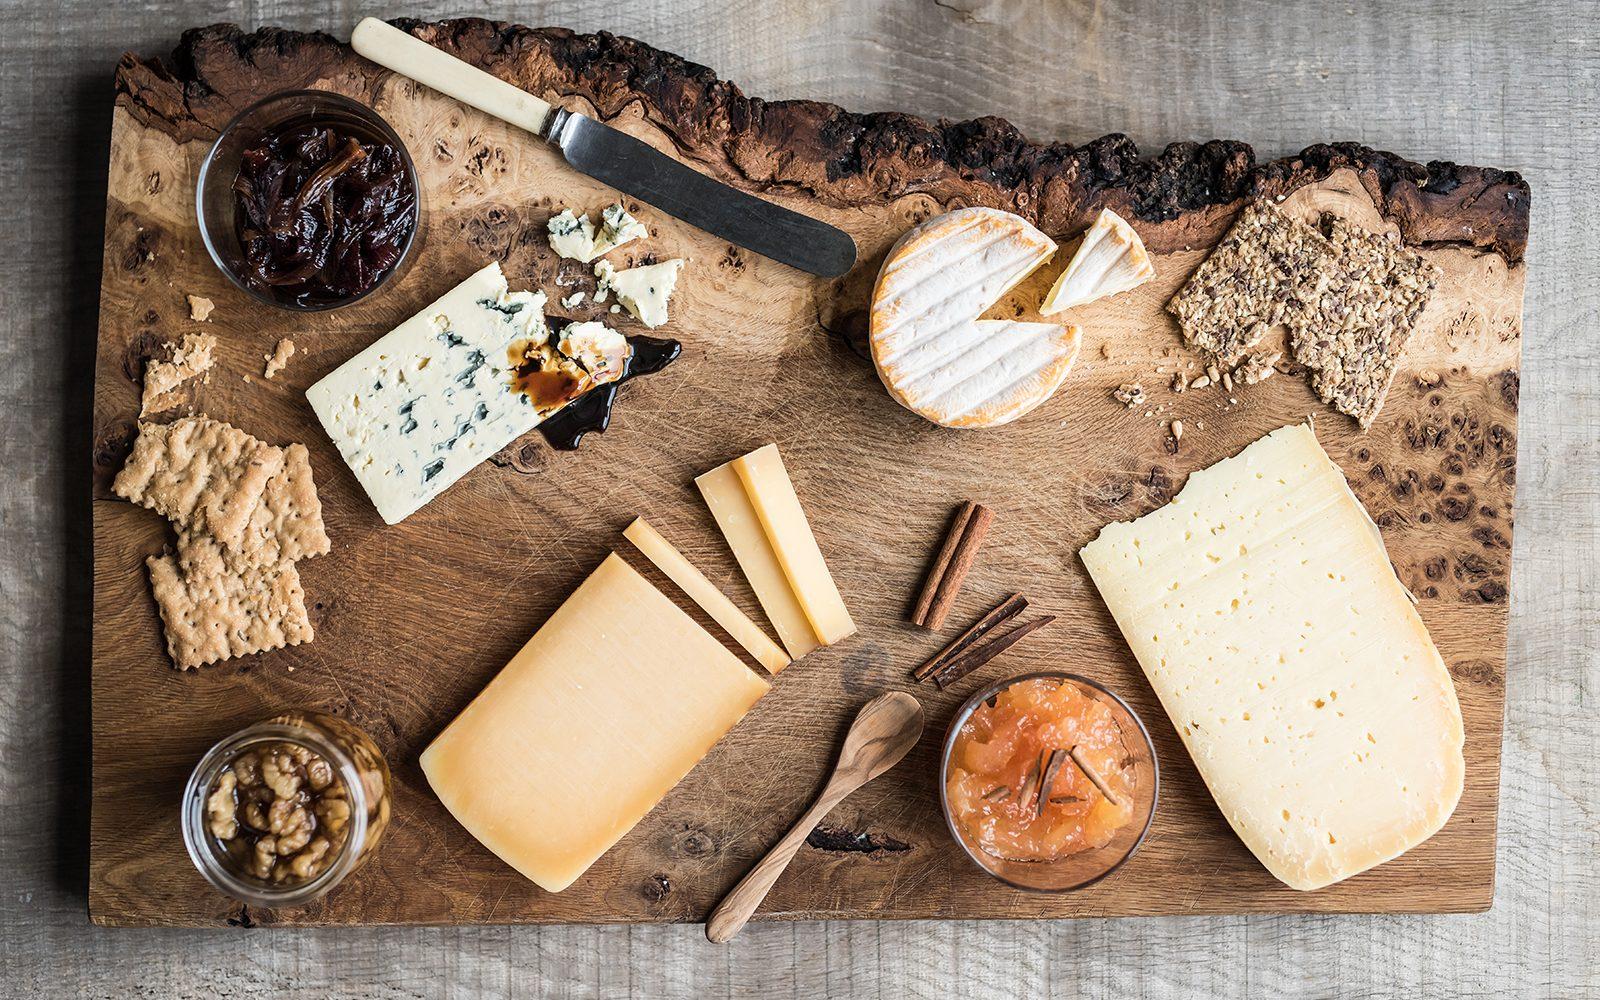 Det klassiske ostebord ruller stadig